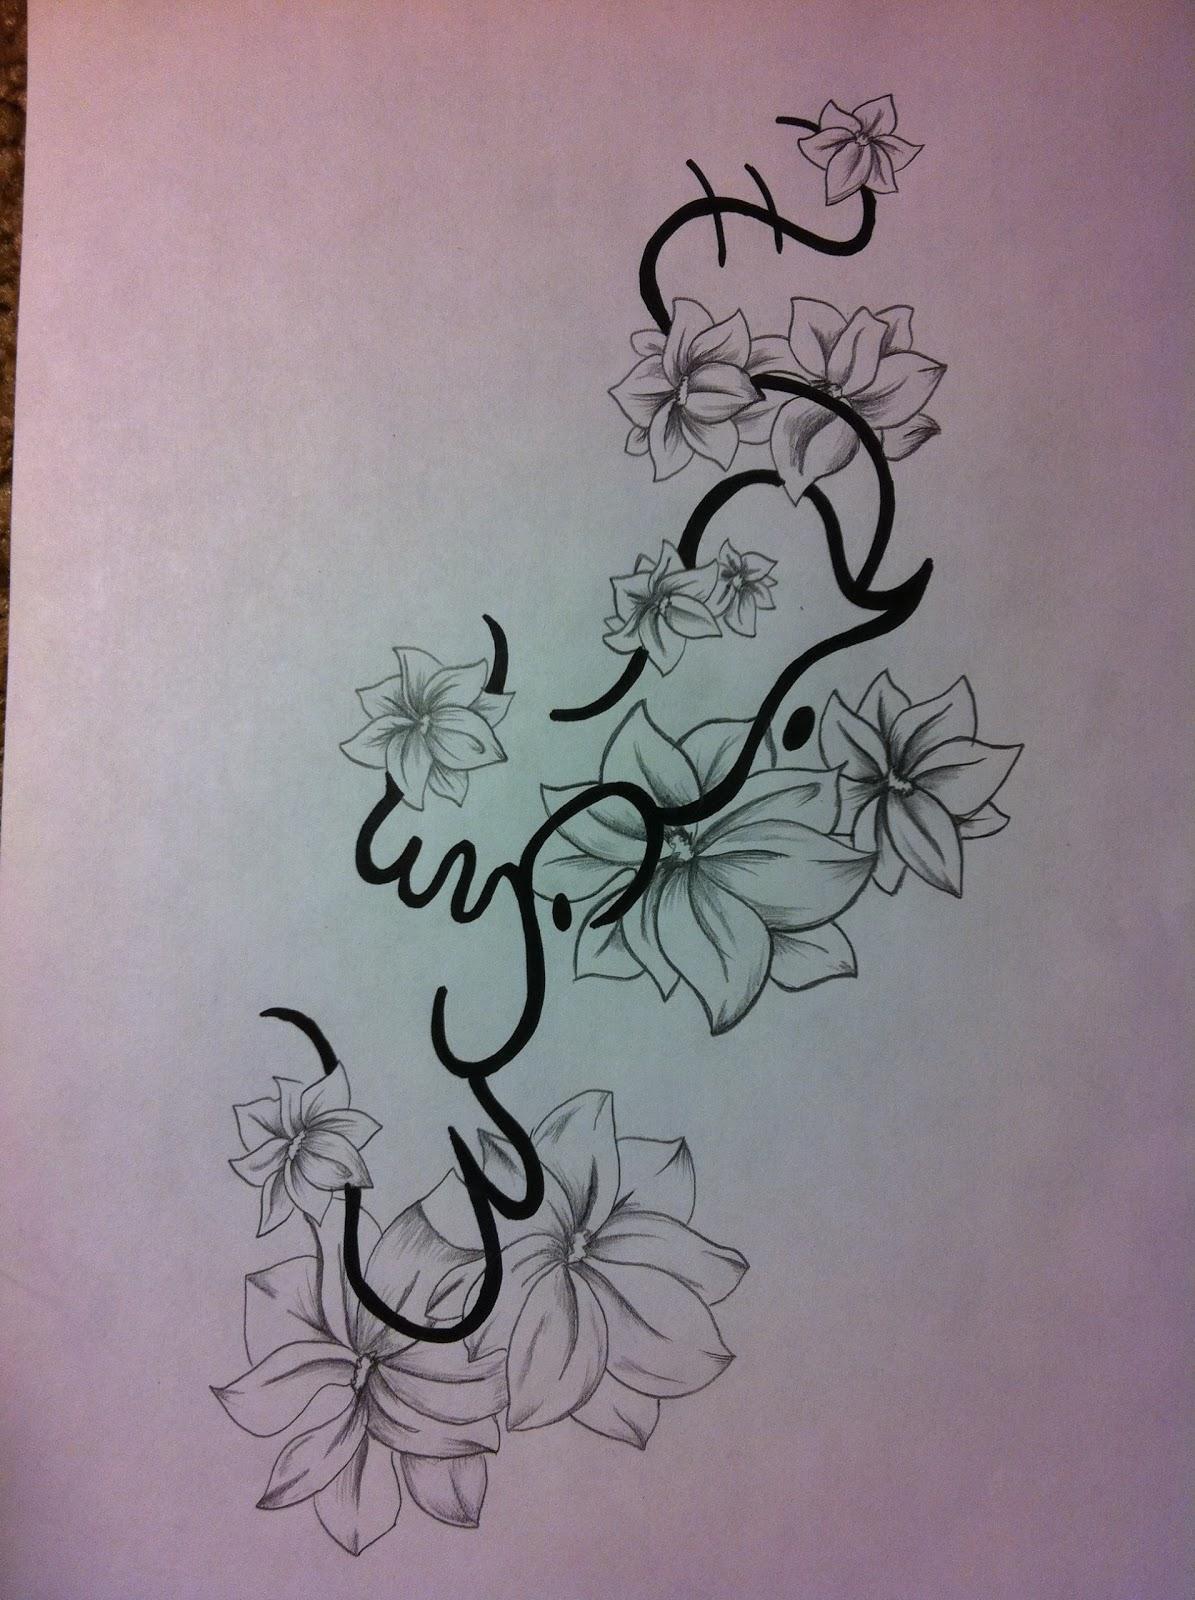 Art of ink alibata simpaguita flower tattoo design for for Sister in law tattoos